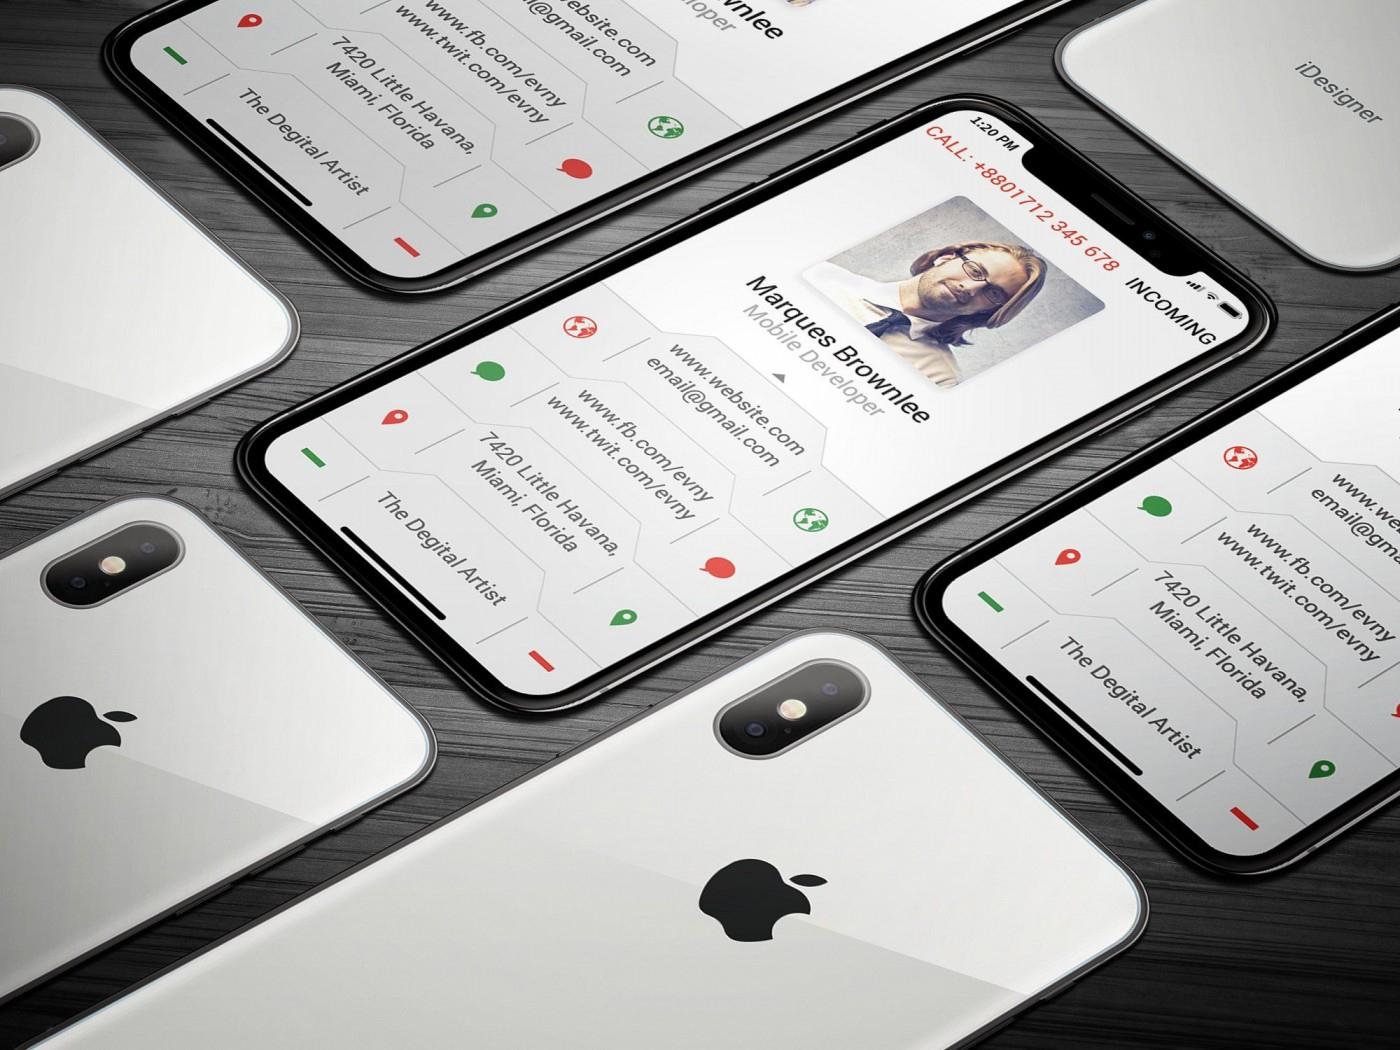 006 Iphone Business Card Template Unusual Ideas Psd Free In Iphone Business Card Template